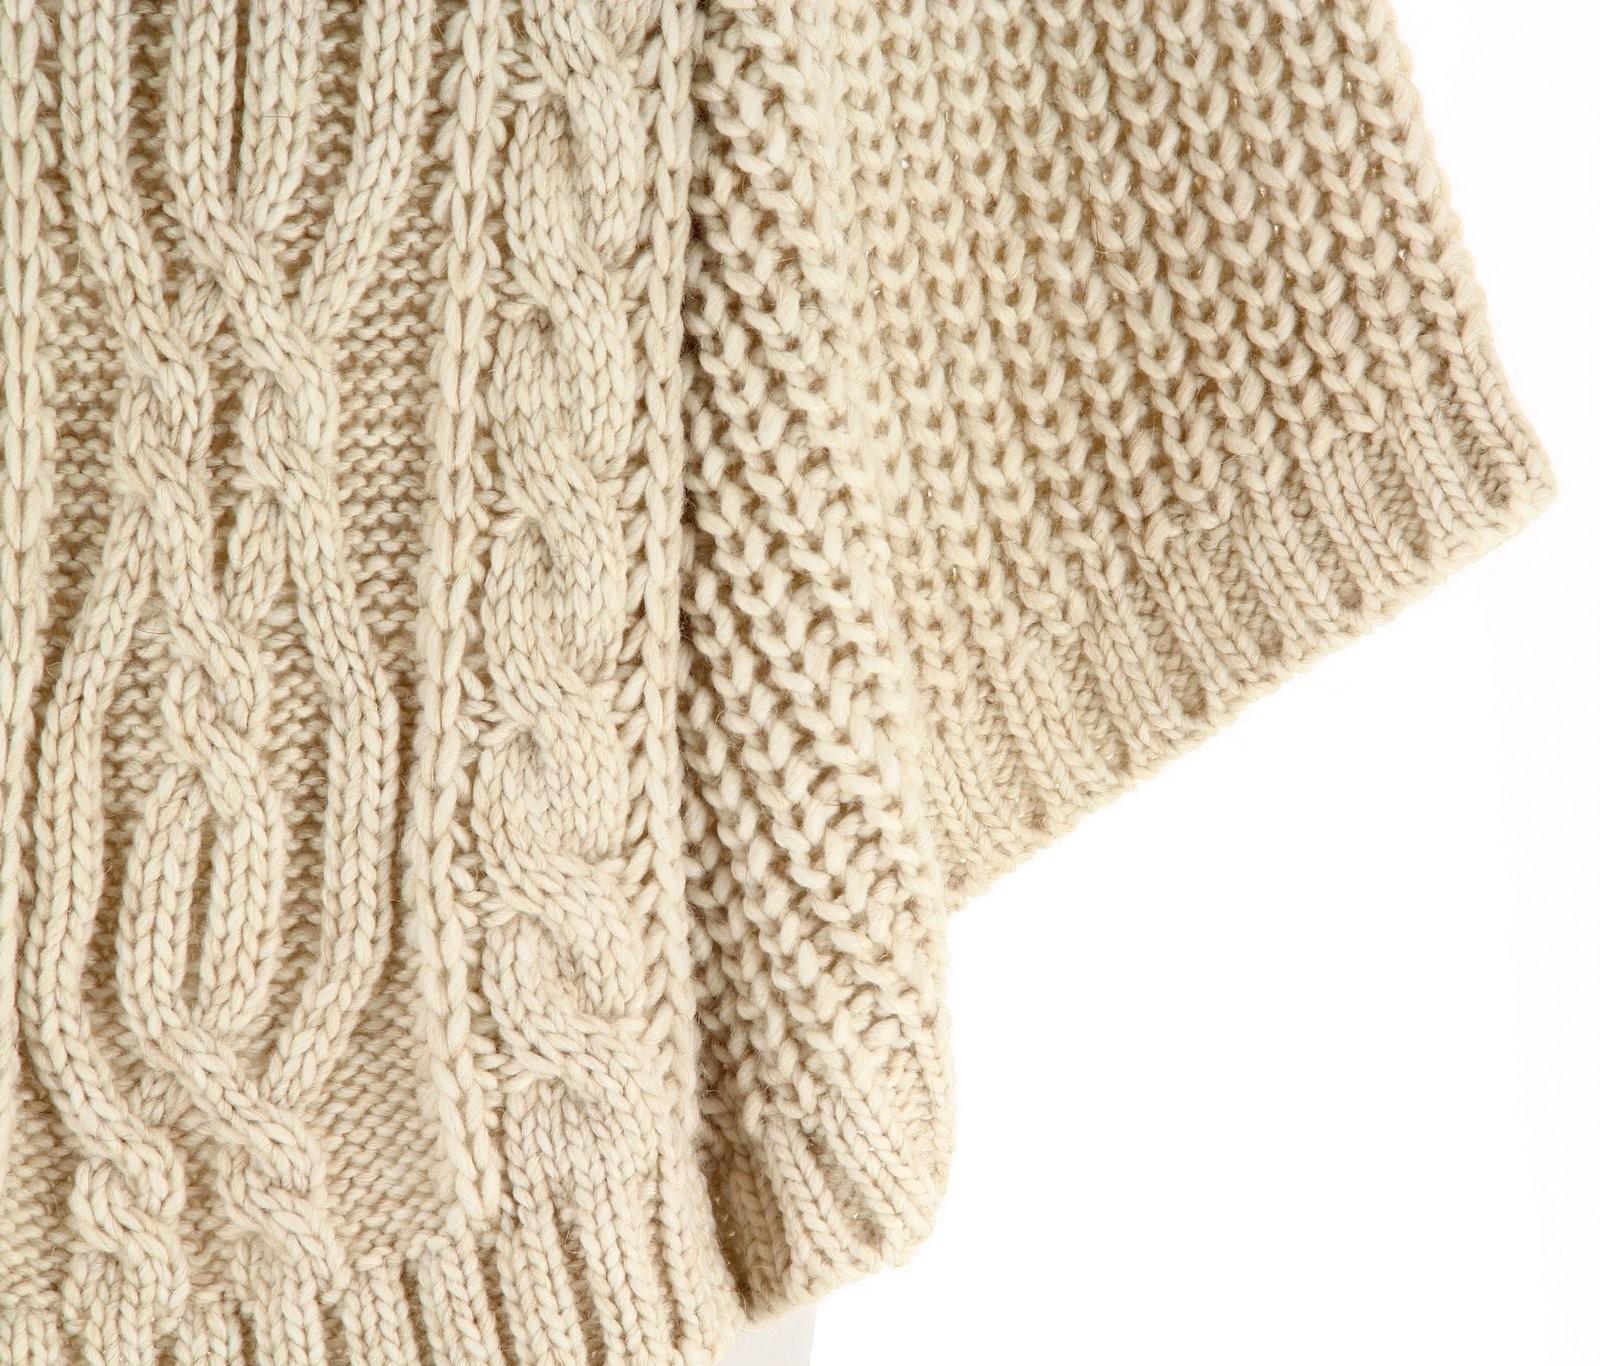 poncho laine alpaga grosse maille hiver beige elodie. Black Bedroom Furniture Sets. Home Design Ideas